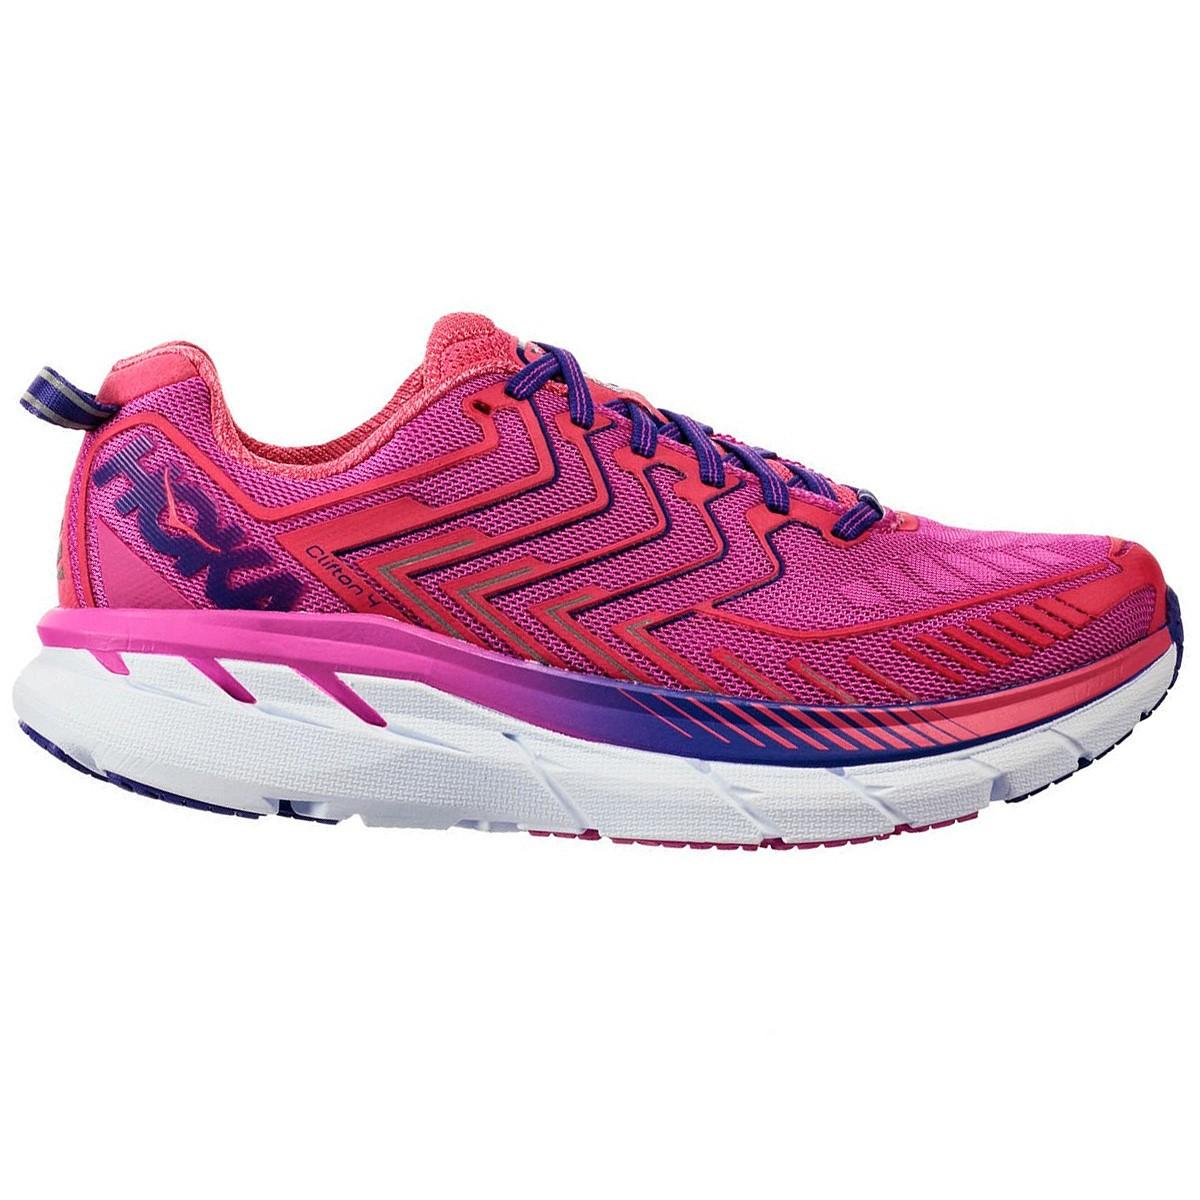 Trail Running Shoes Hoka One One Clifton 4 Woman Trail